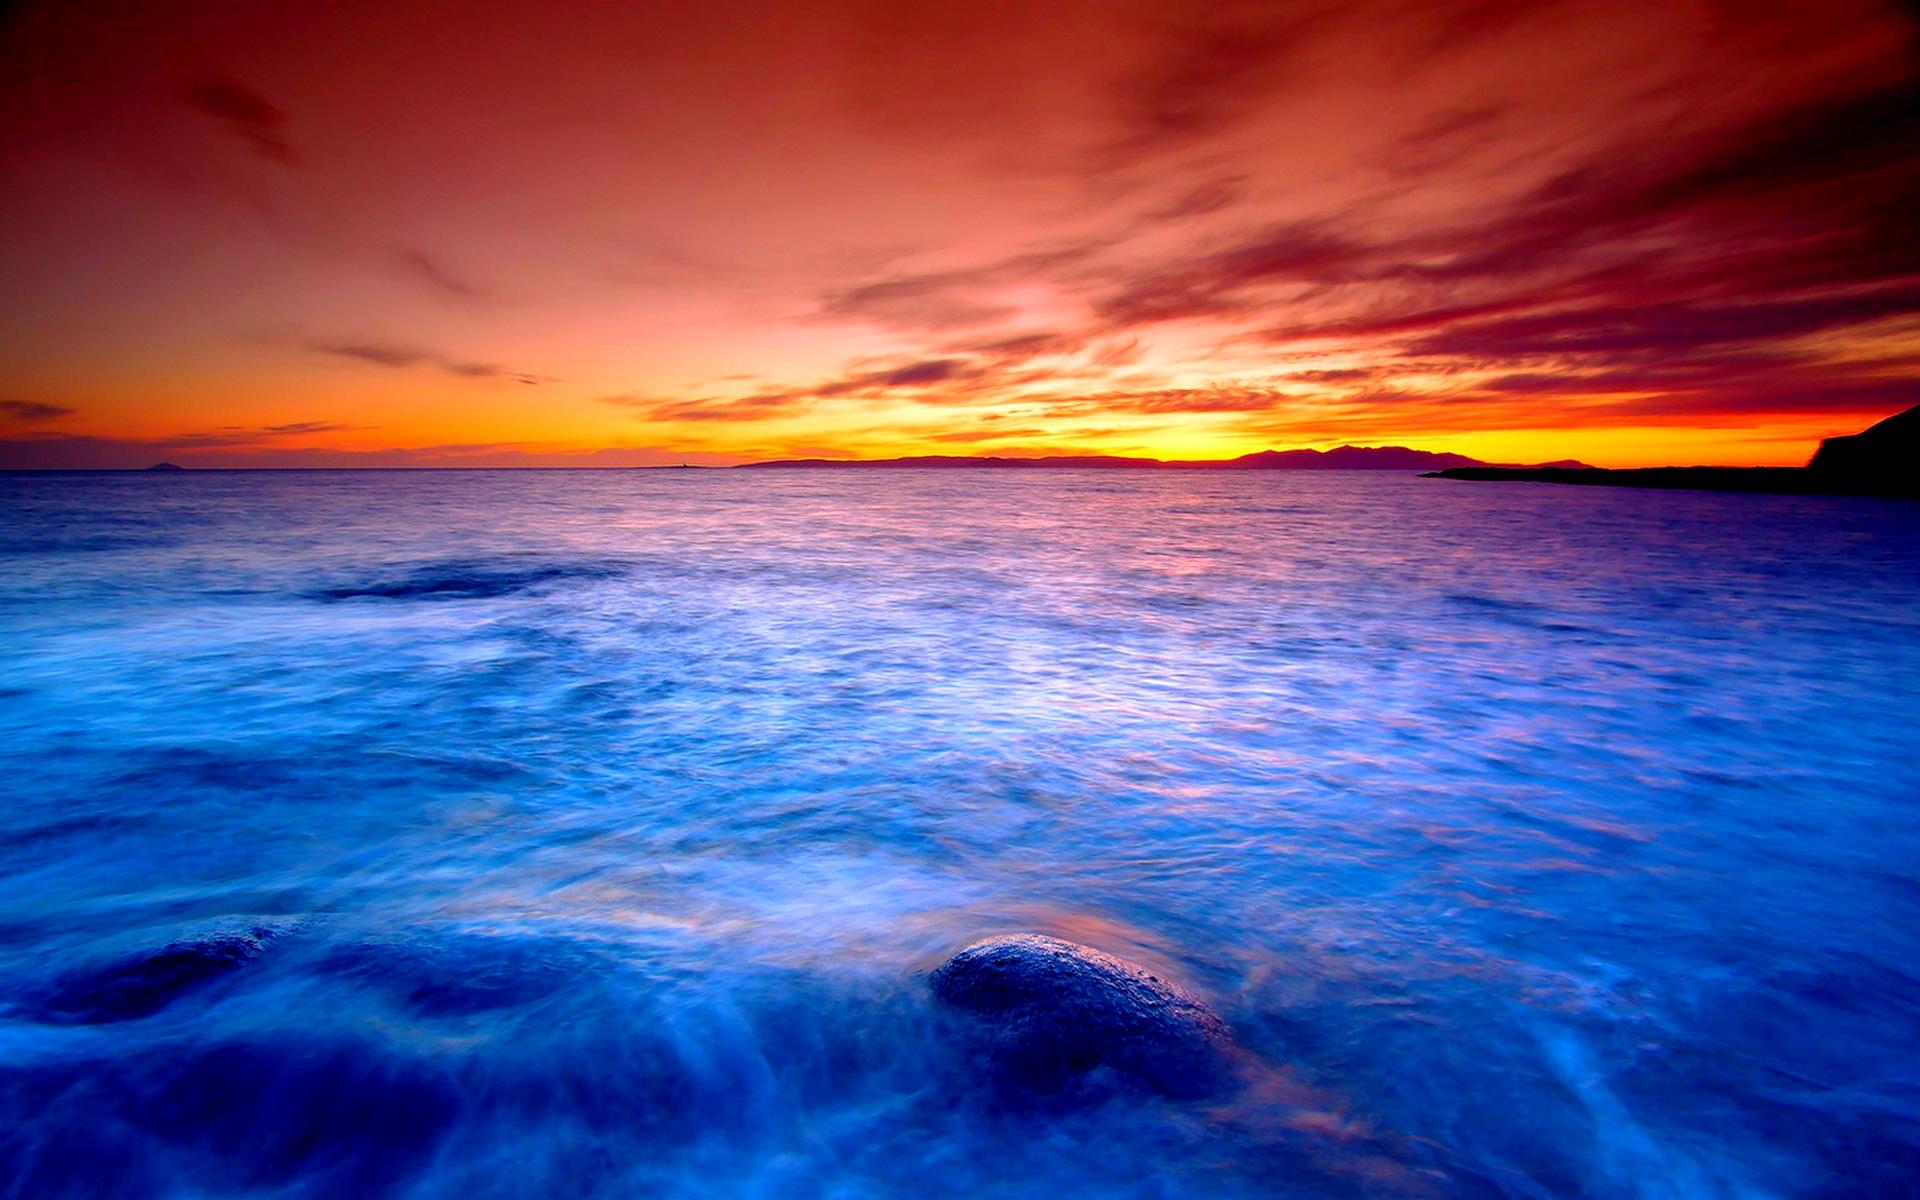 Gallery For > Hd Ocean Sunset Wallpaper